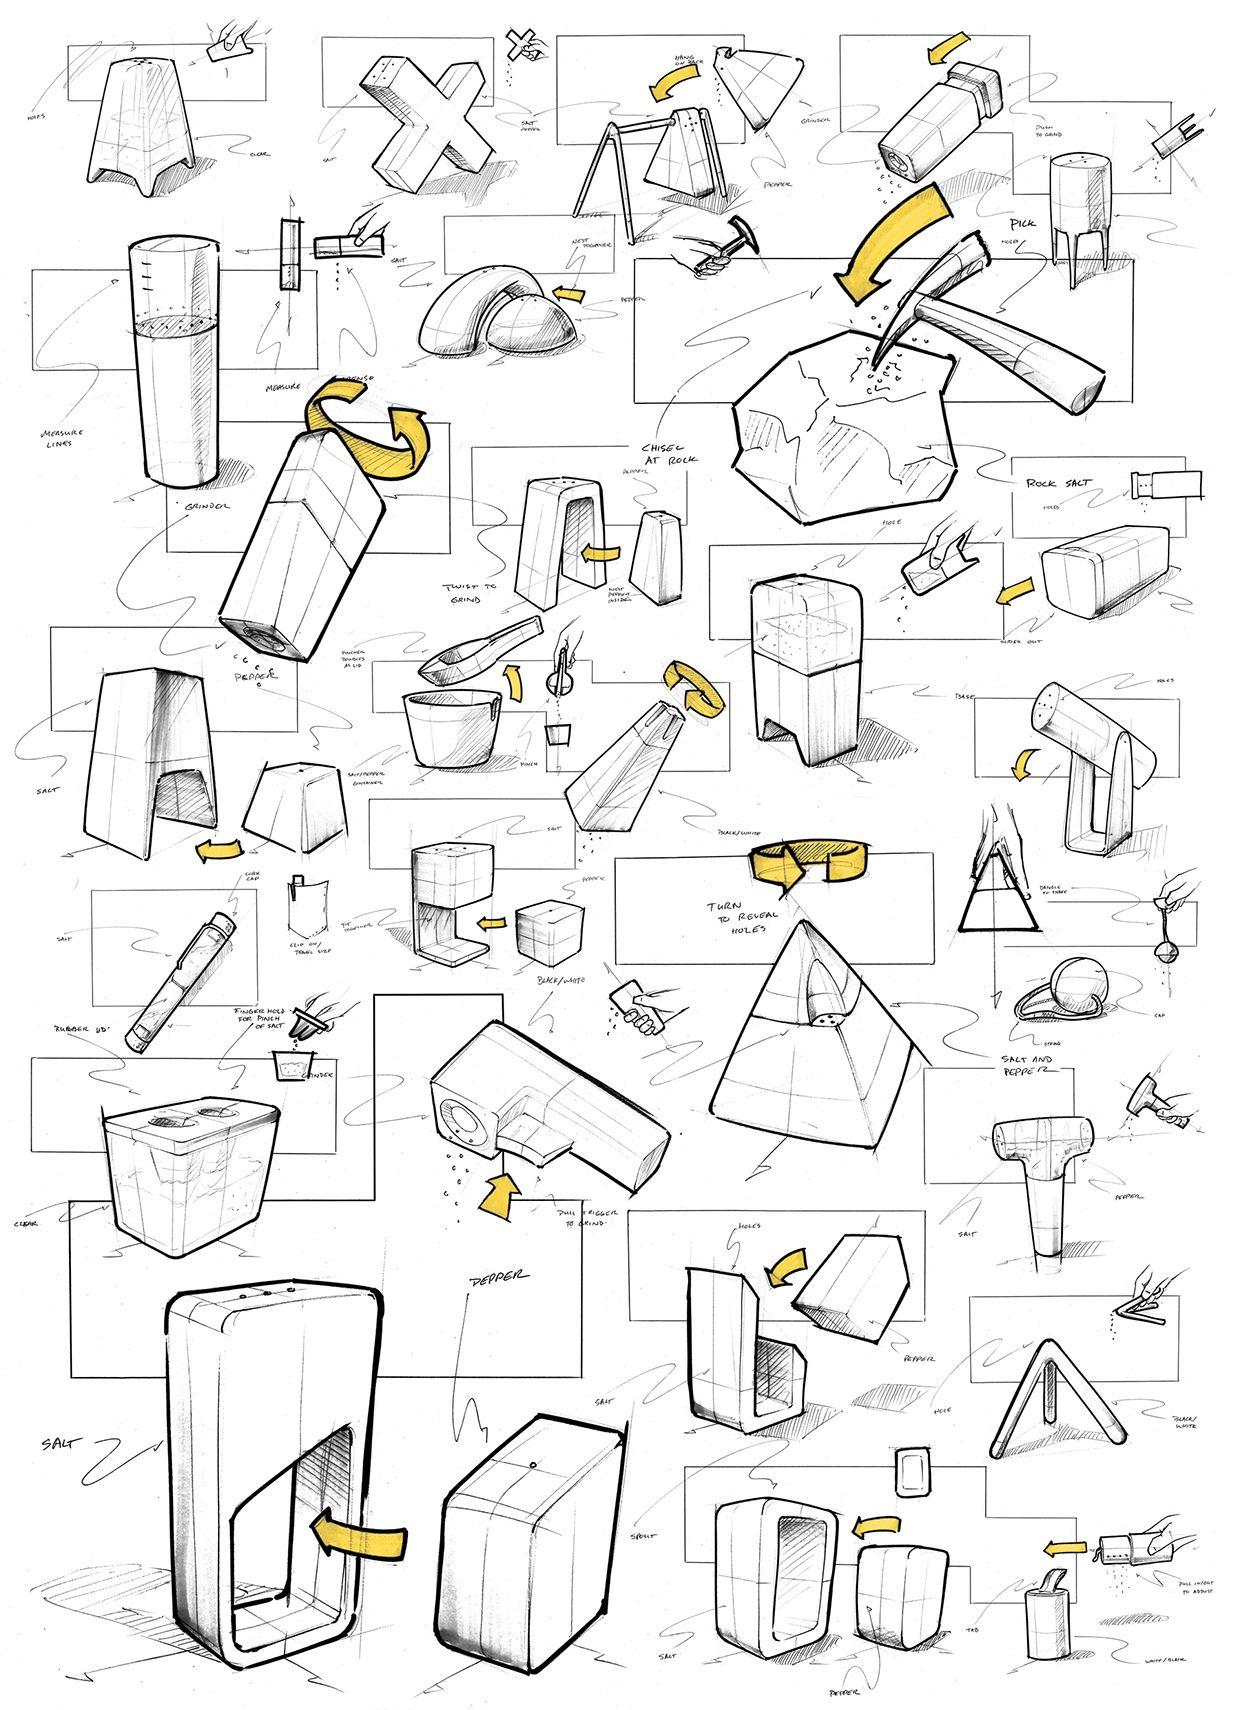 Industrial Design: 「Salt+Pepper Pot」/ Fine Pen / Idea Sketch / Clean Style